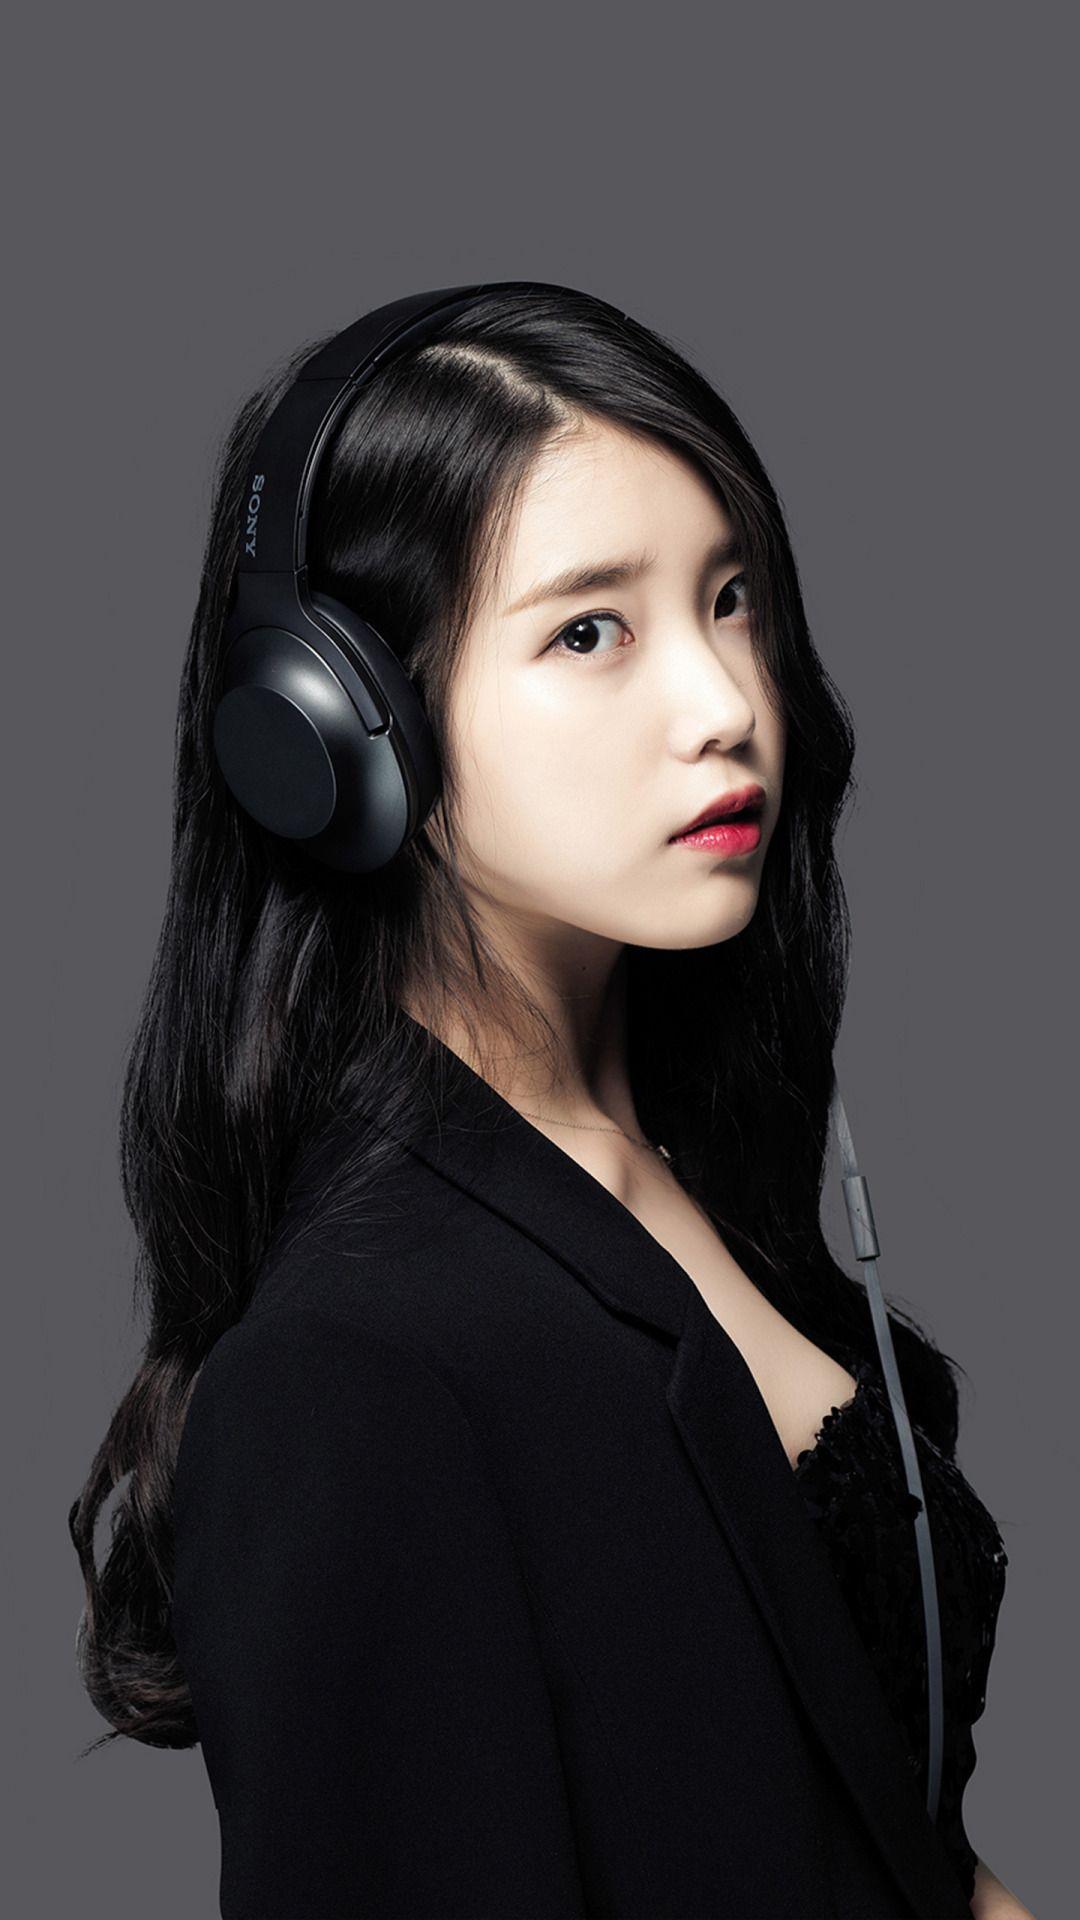 Iumushimushi Sony Headphones Girl With Headphones Sony